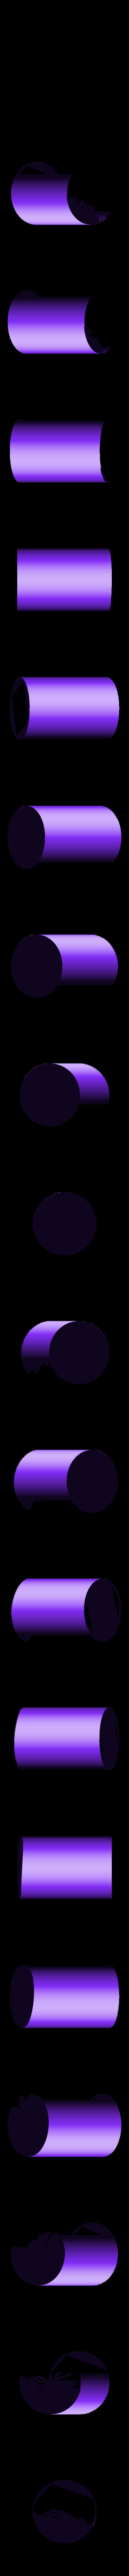 eye_black_right.stl Download free STL file Monster Tweety - multi-color • 3D print template, bpitanga